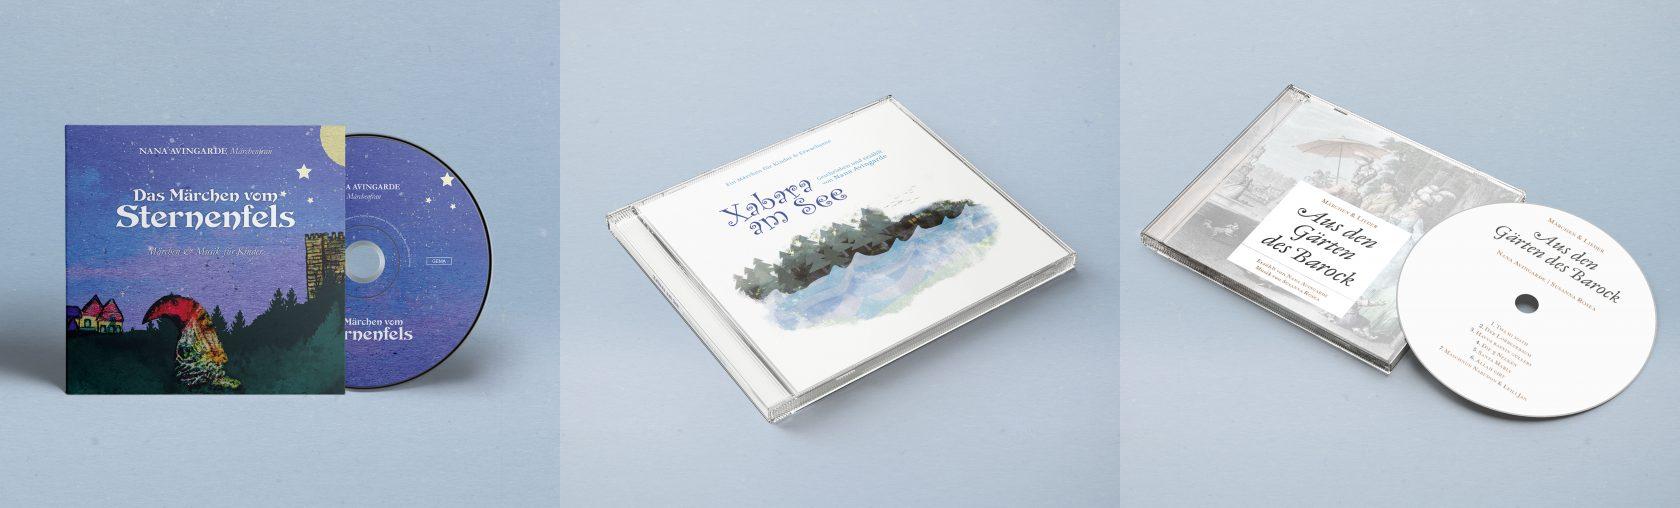 Märchen Hörbuch CDs